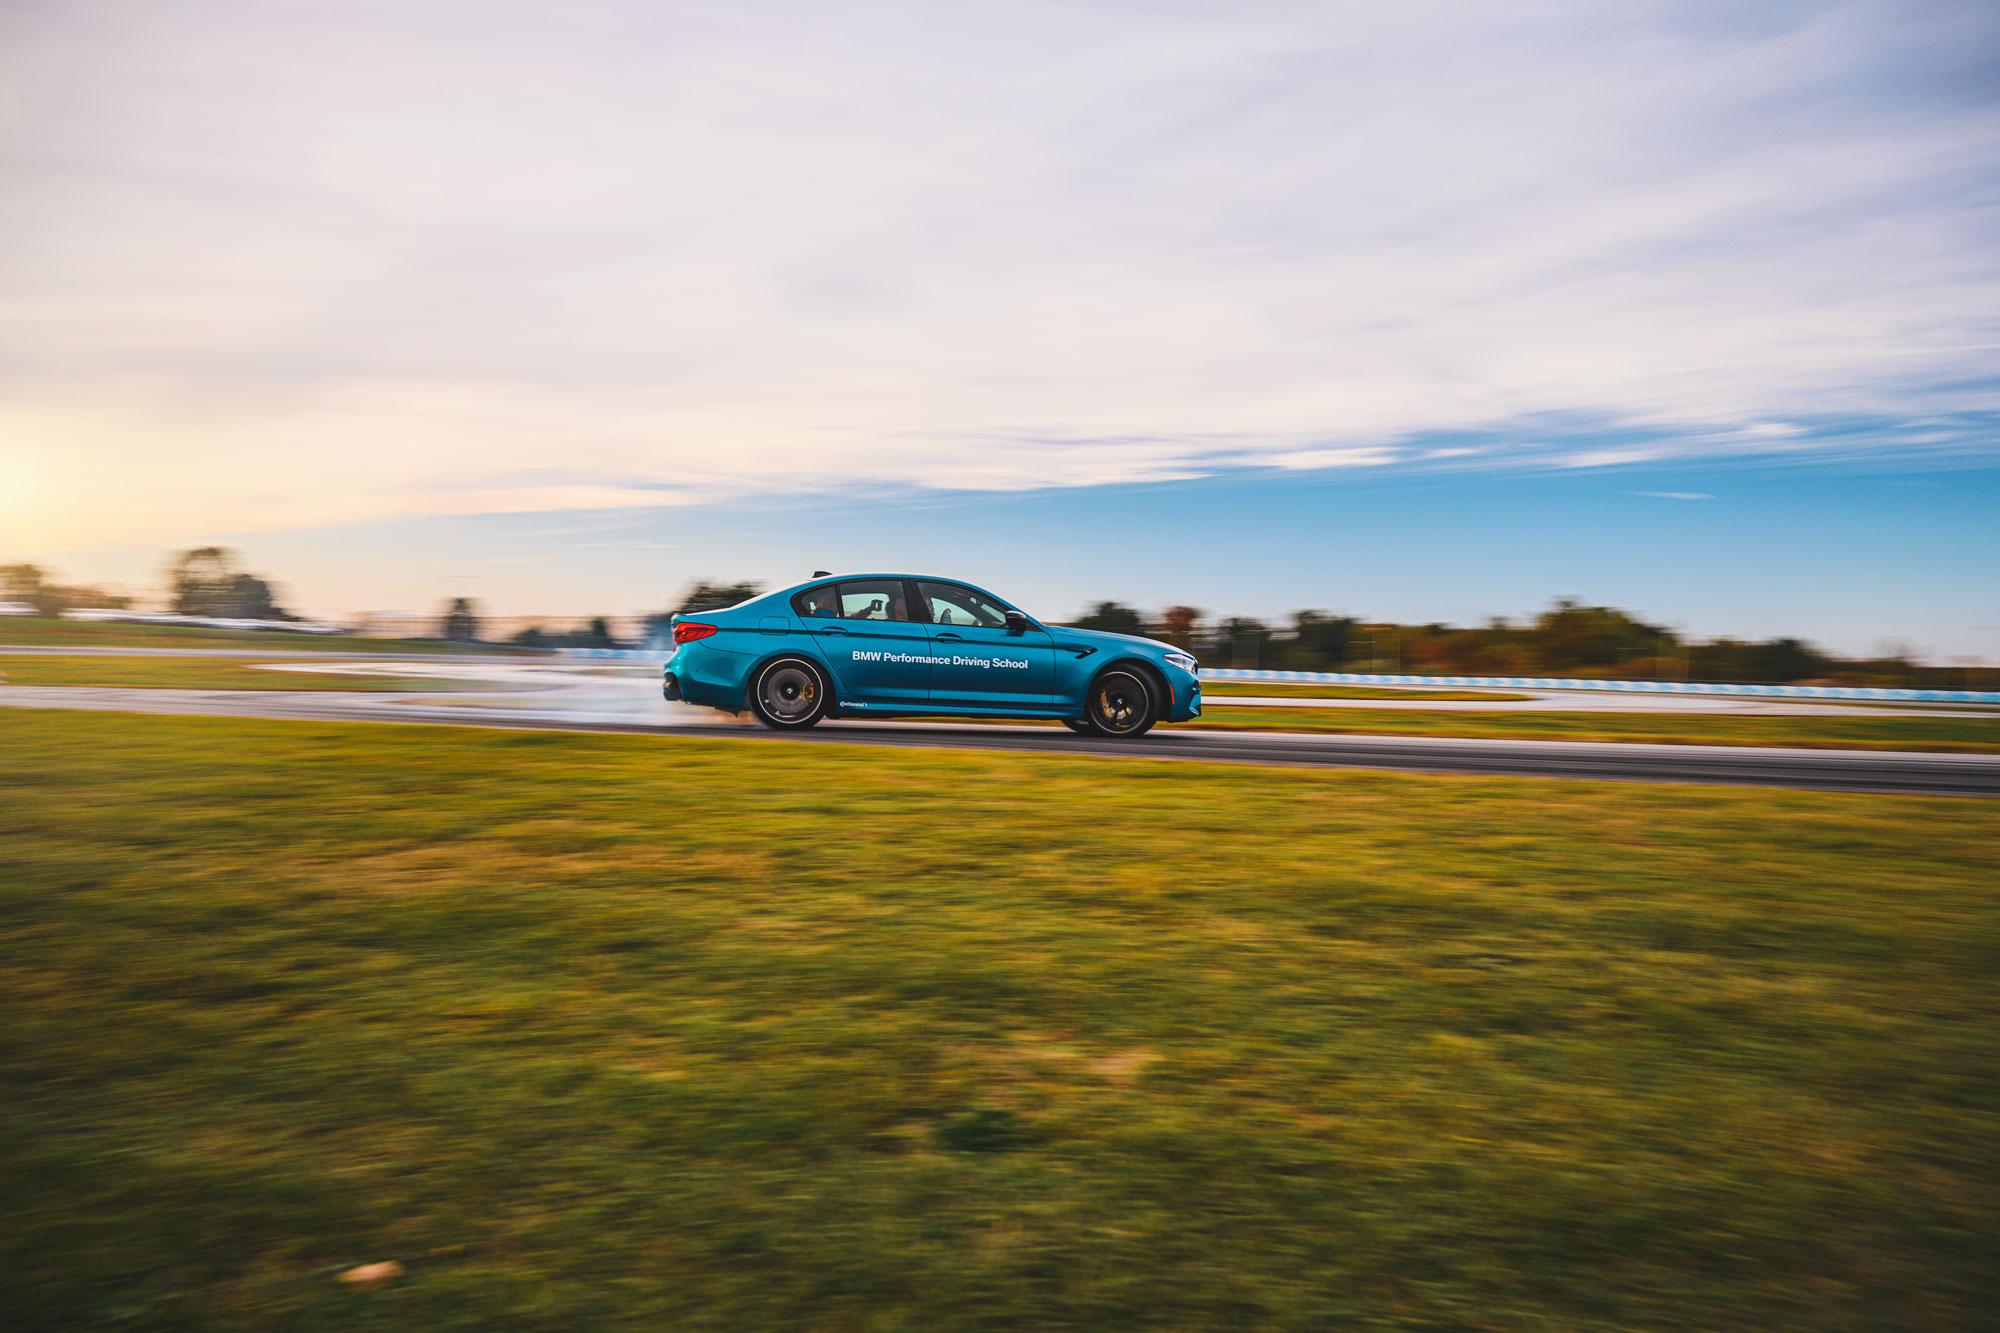 BMW M5 hot lap